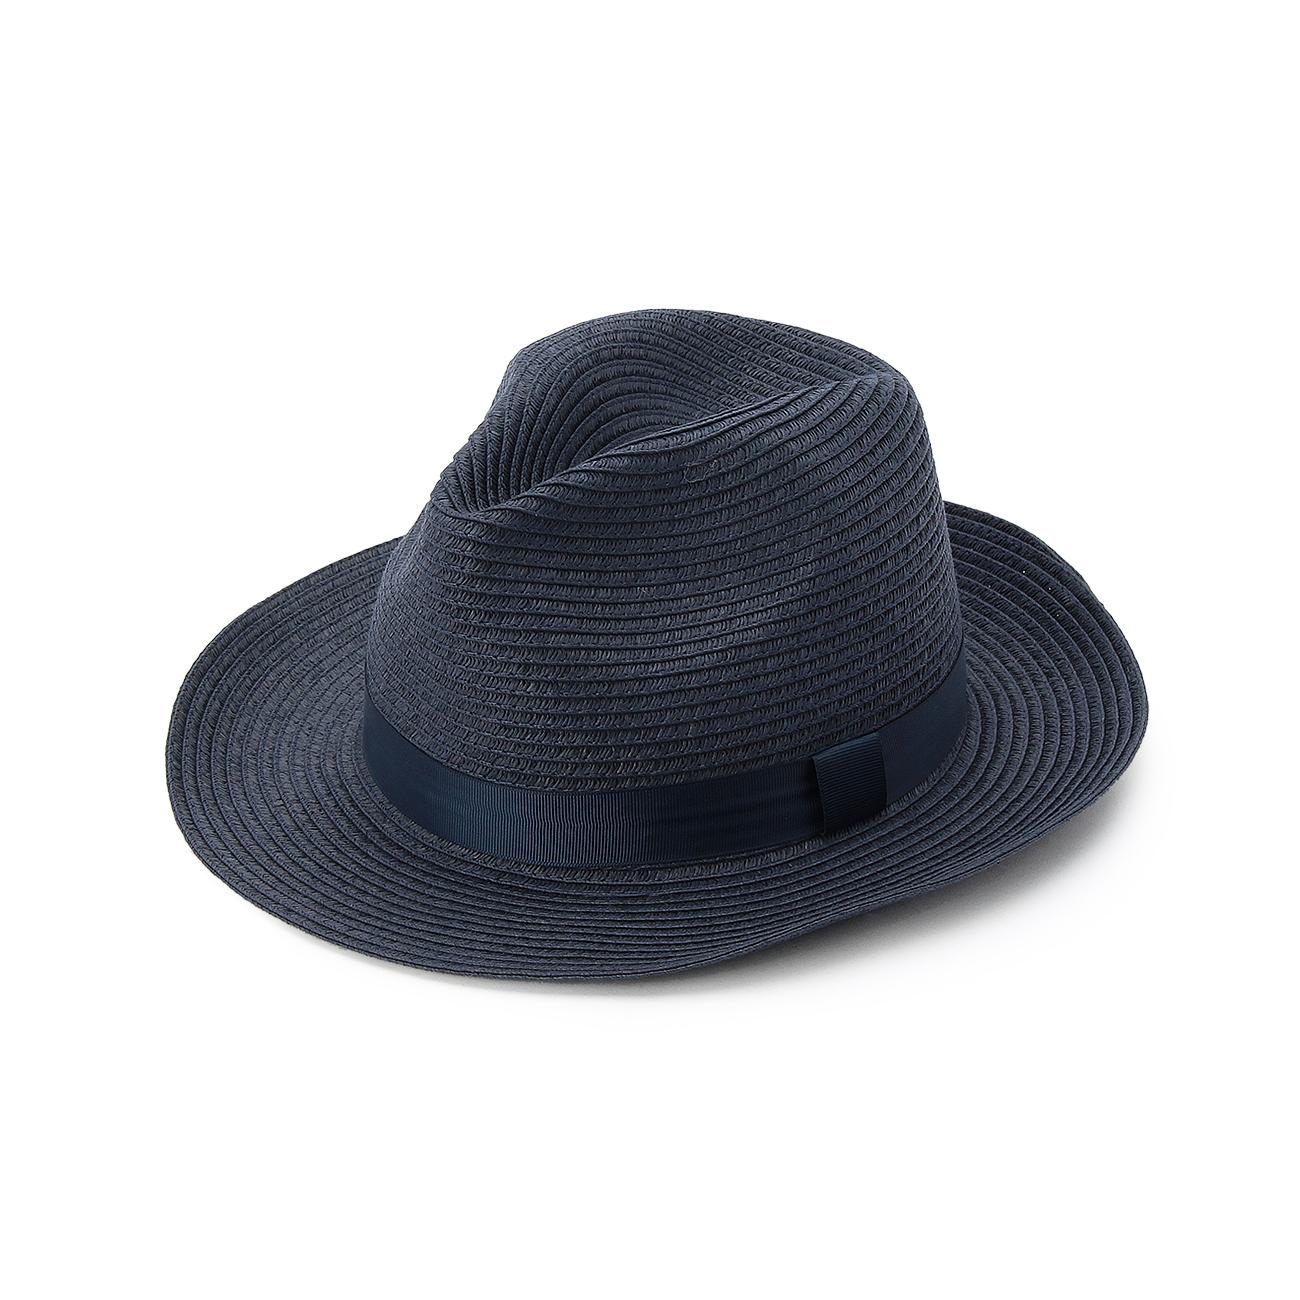 【THE SHOP TK(Men) (ザ ショップ ティーケー(メンズ))】ペーパー中折れハットメンズ 帽子|ハット ネイビー